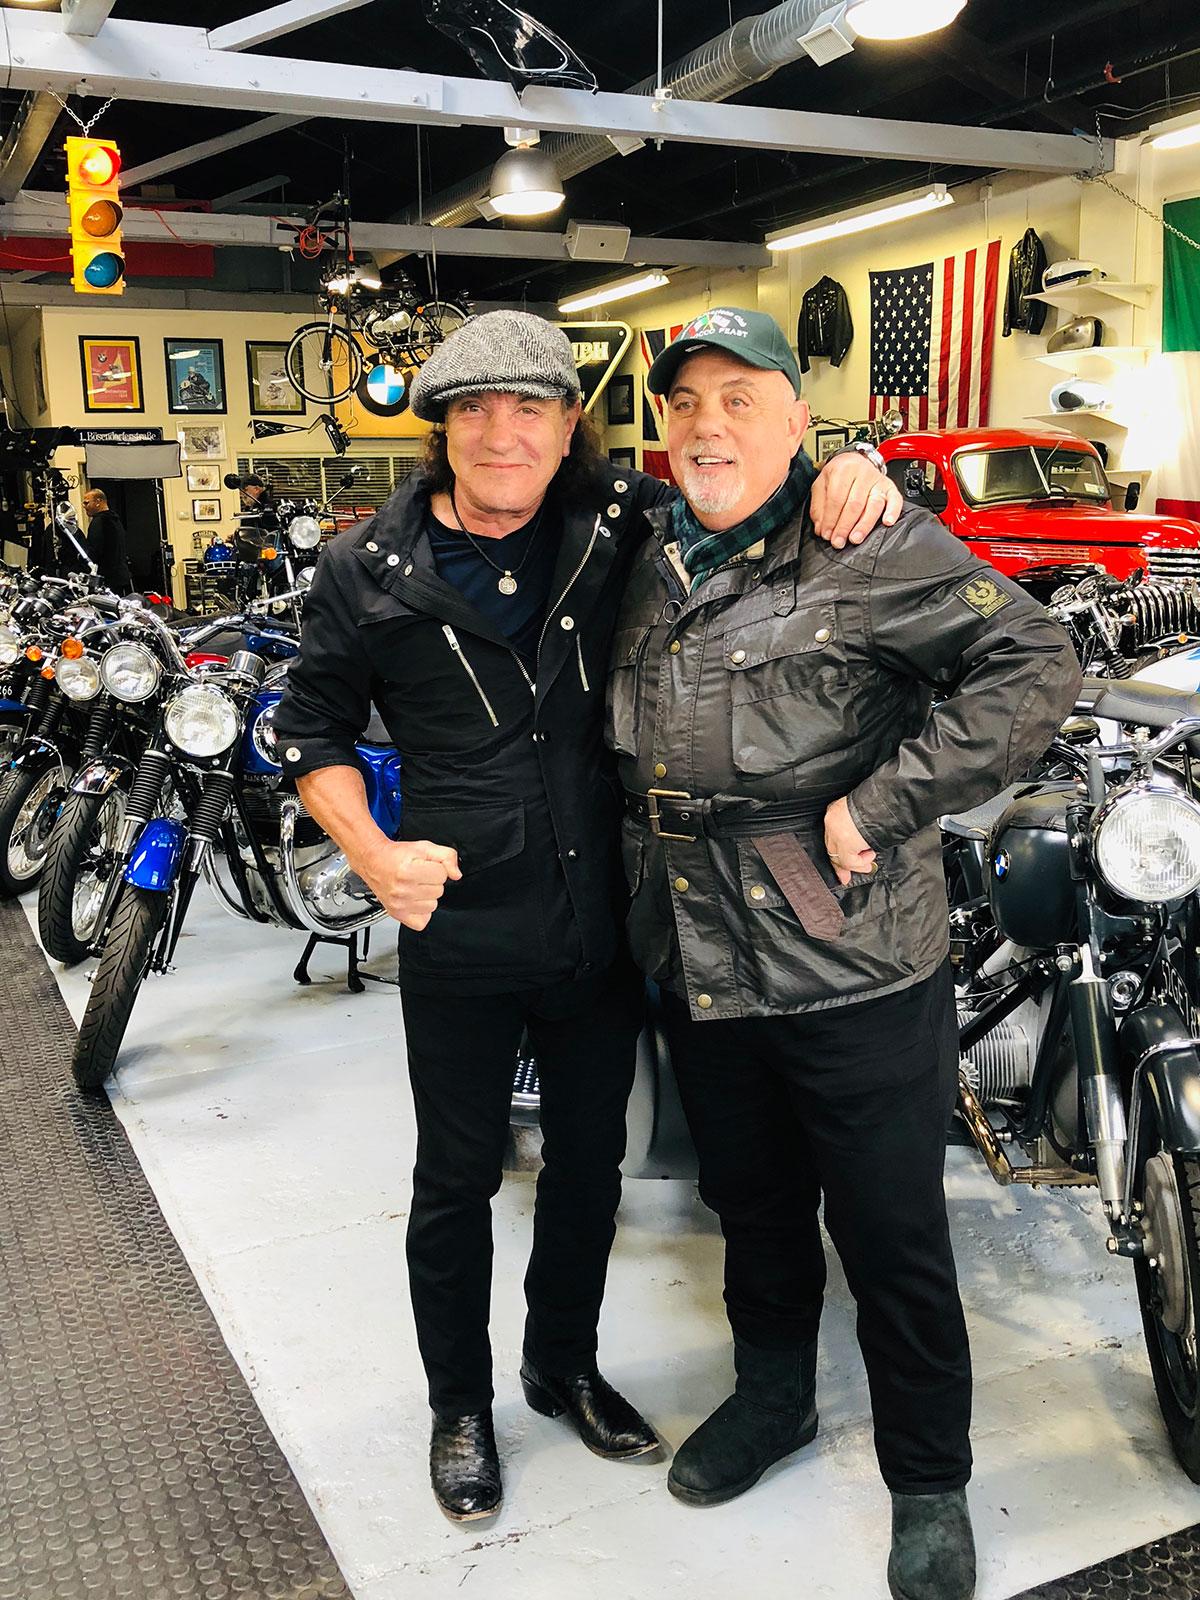 Billy Joel and Brian Johnson at 20th Century Cycles